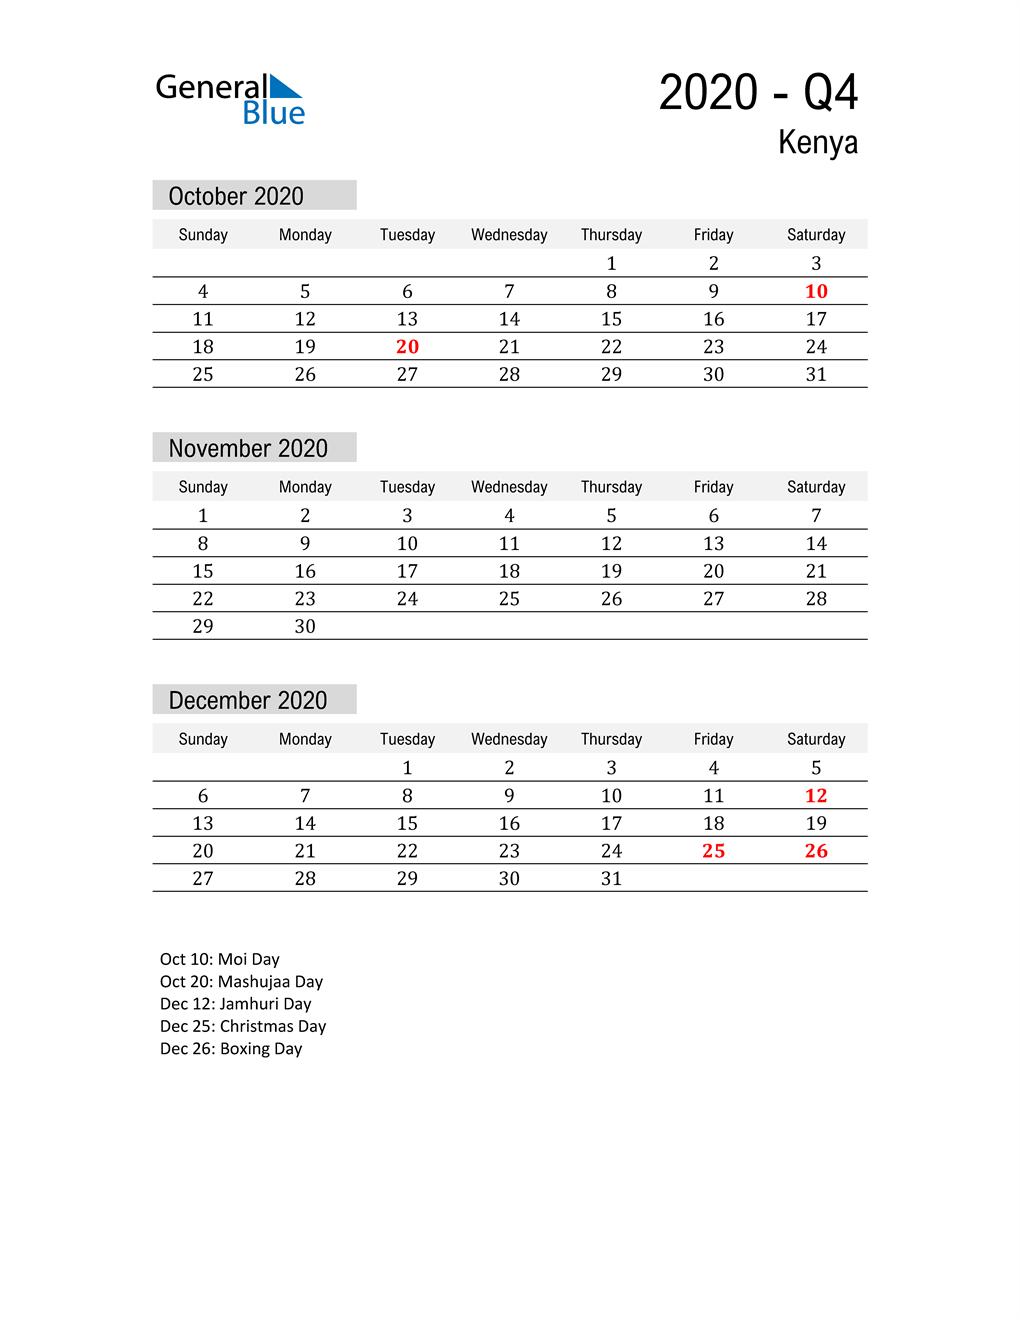 Kenya Quarter 4 2020 Calendar